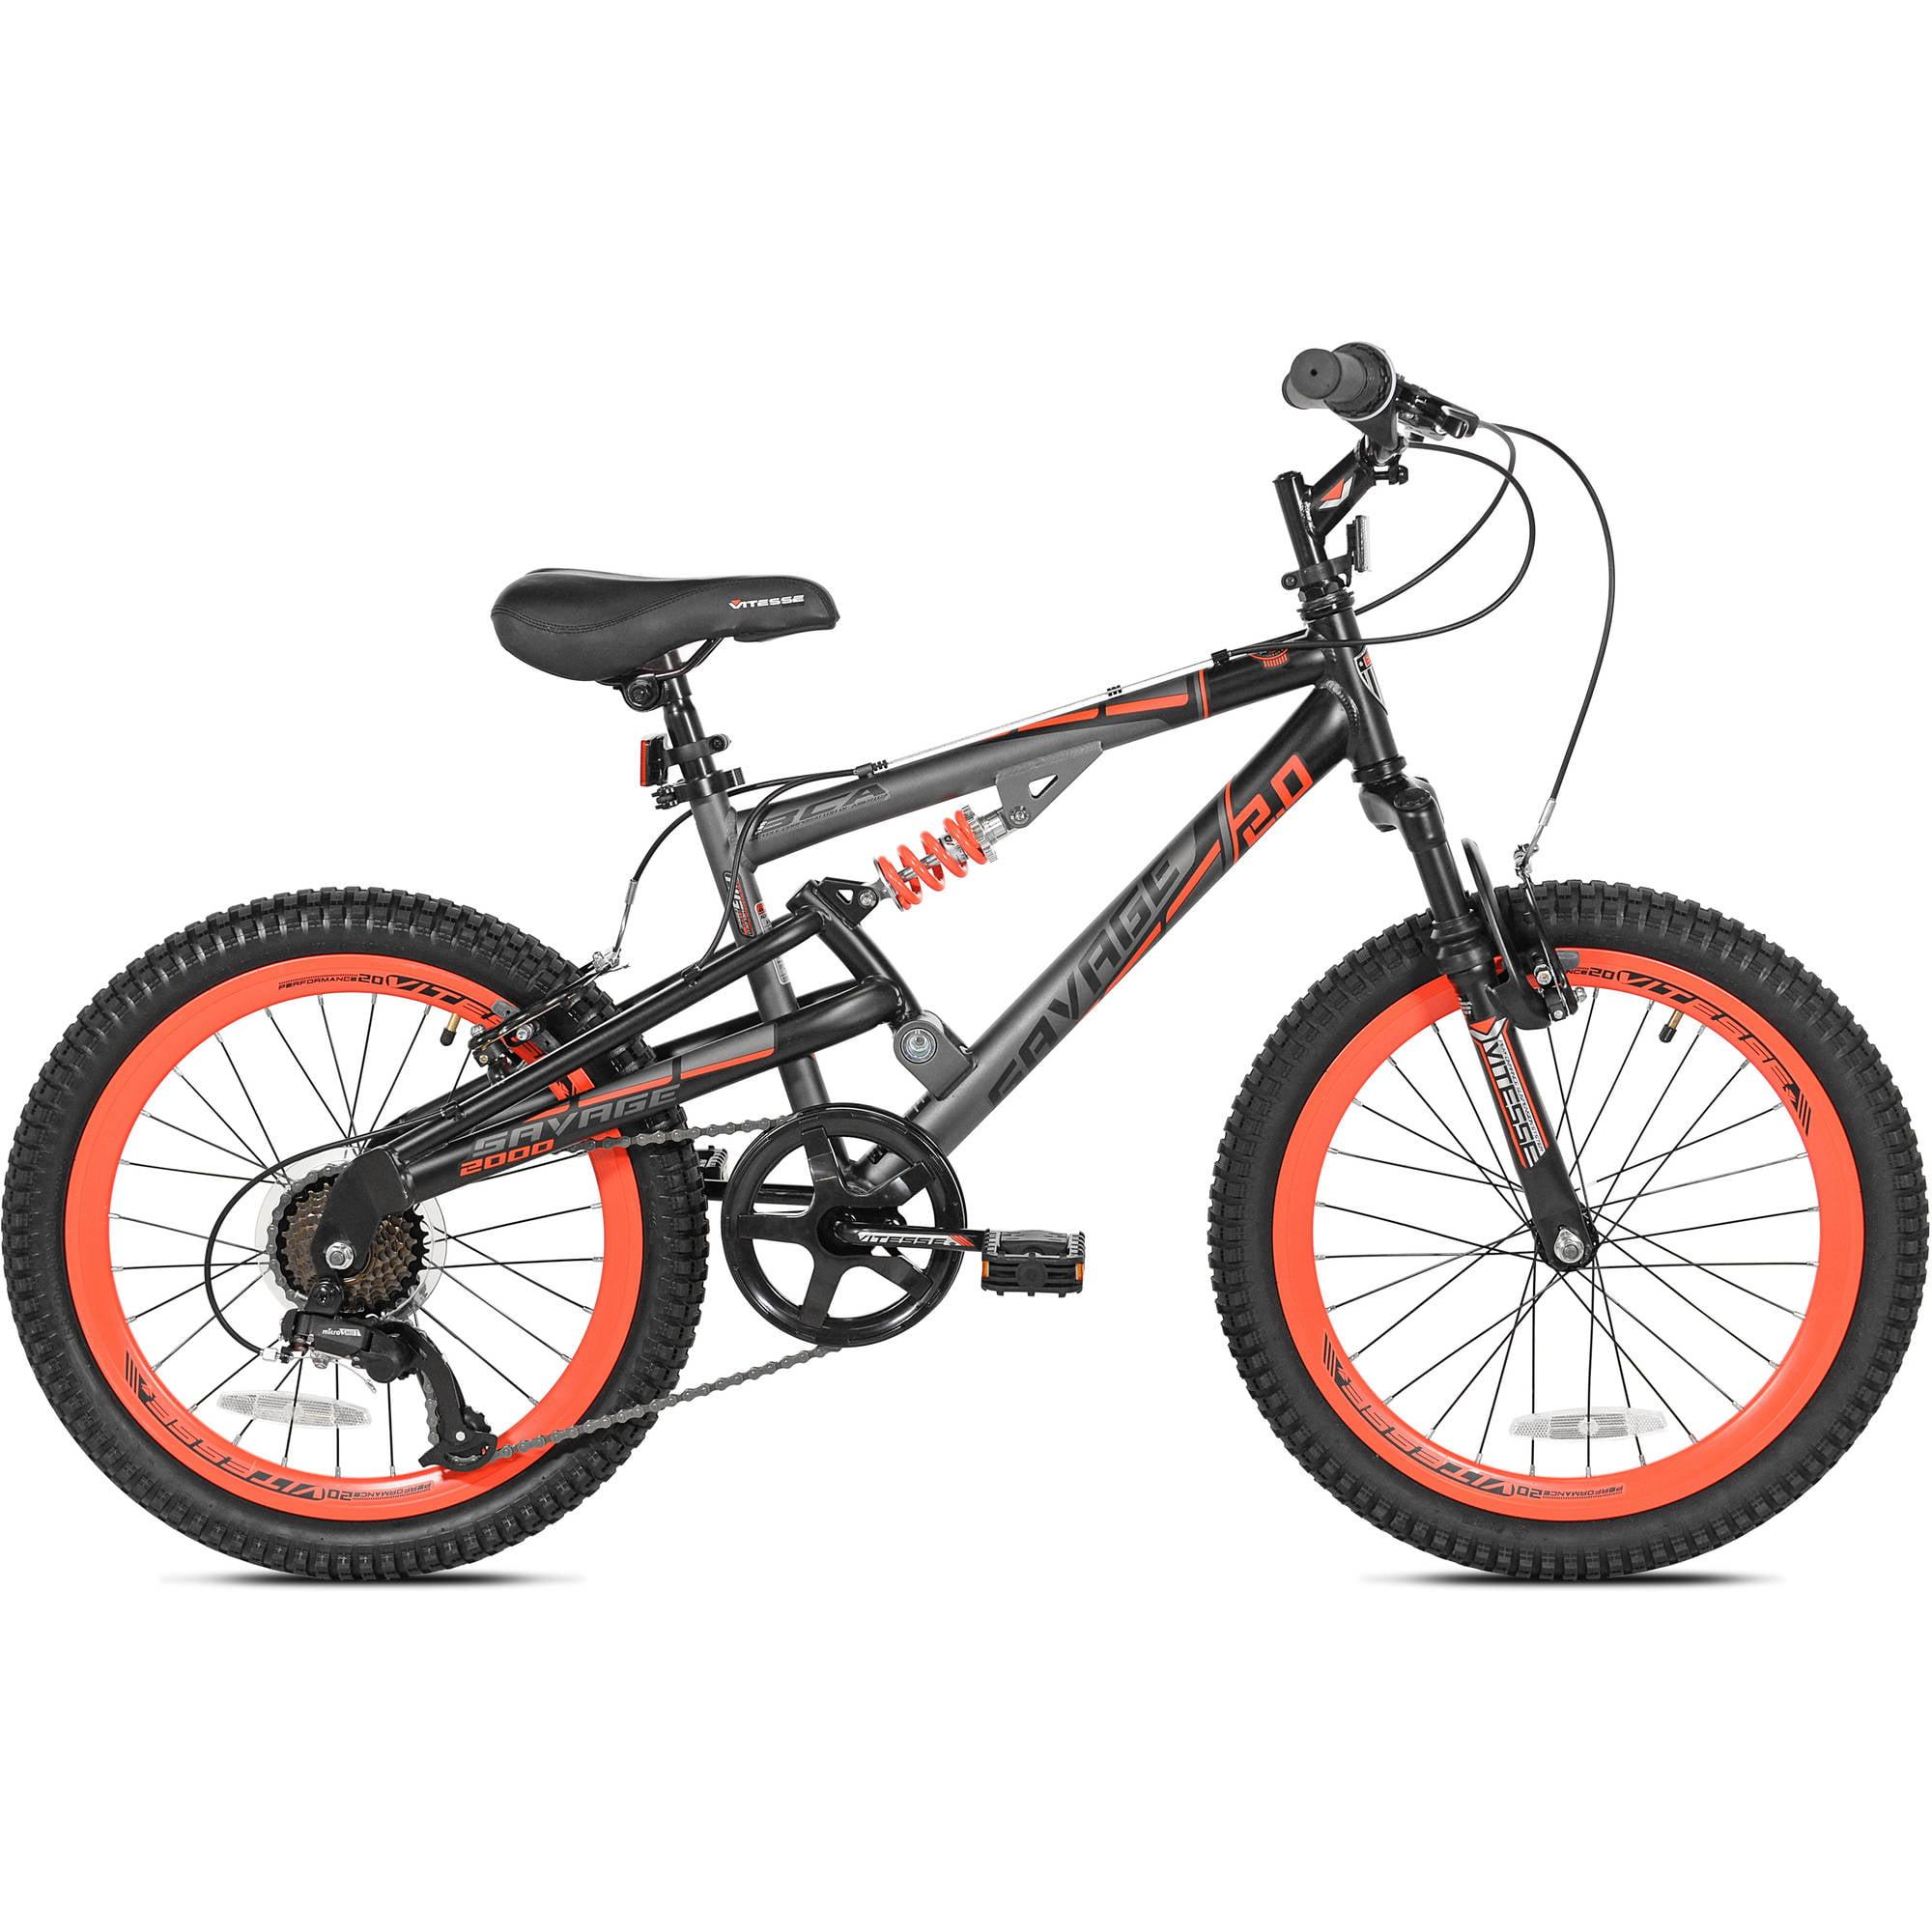 Bca 20 Boys Savage 2 0 Bike Gray Orange For Ages 8 12 Walmart Com